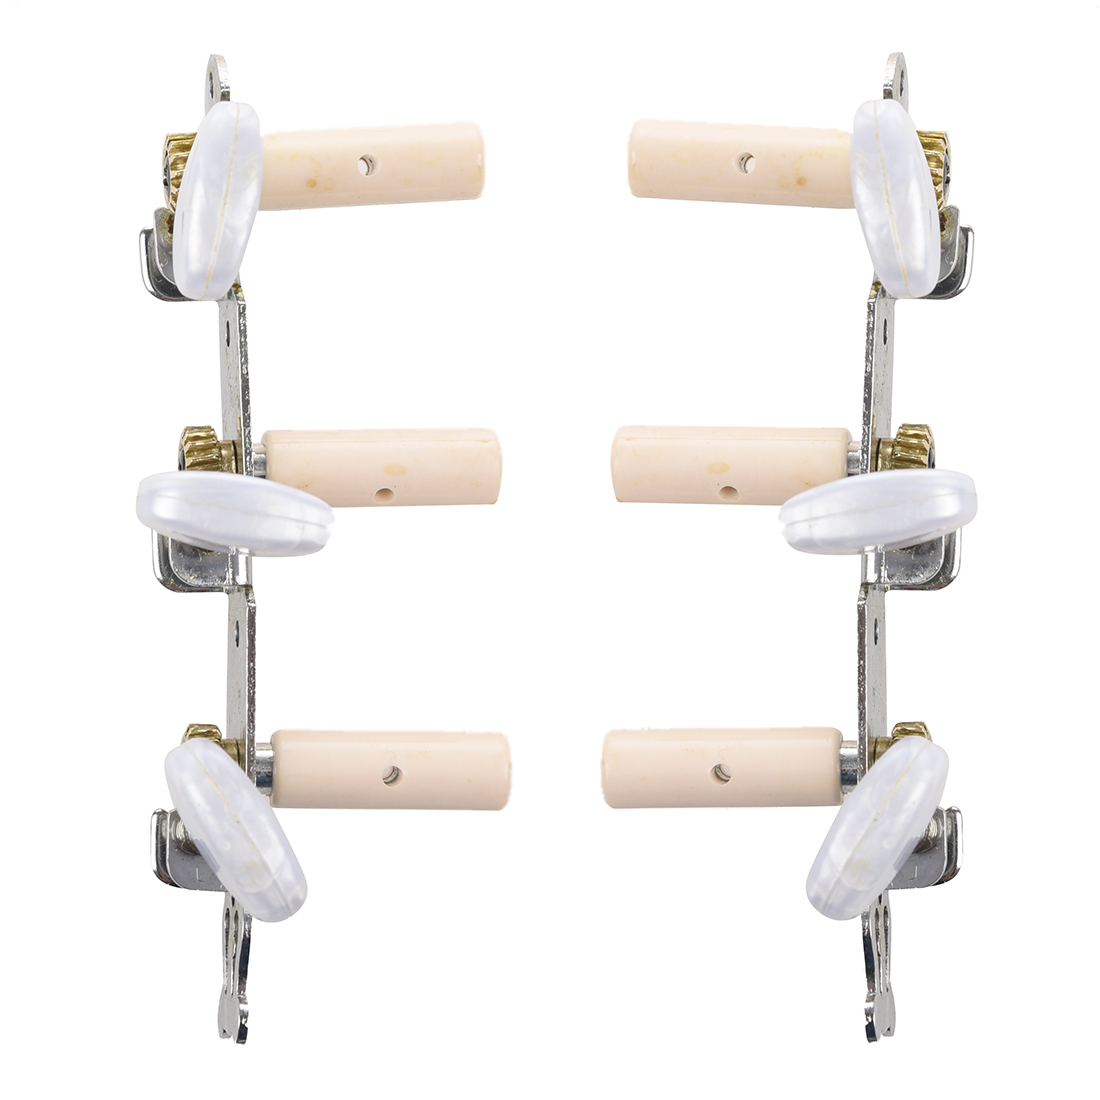 12pcs (6pcs Classical Guitar Tuning Pegs Machine Heads Oval Button 2 pcs per set high end classical guitar tuning pegs machine heads gold button color 1 18 ratio